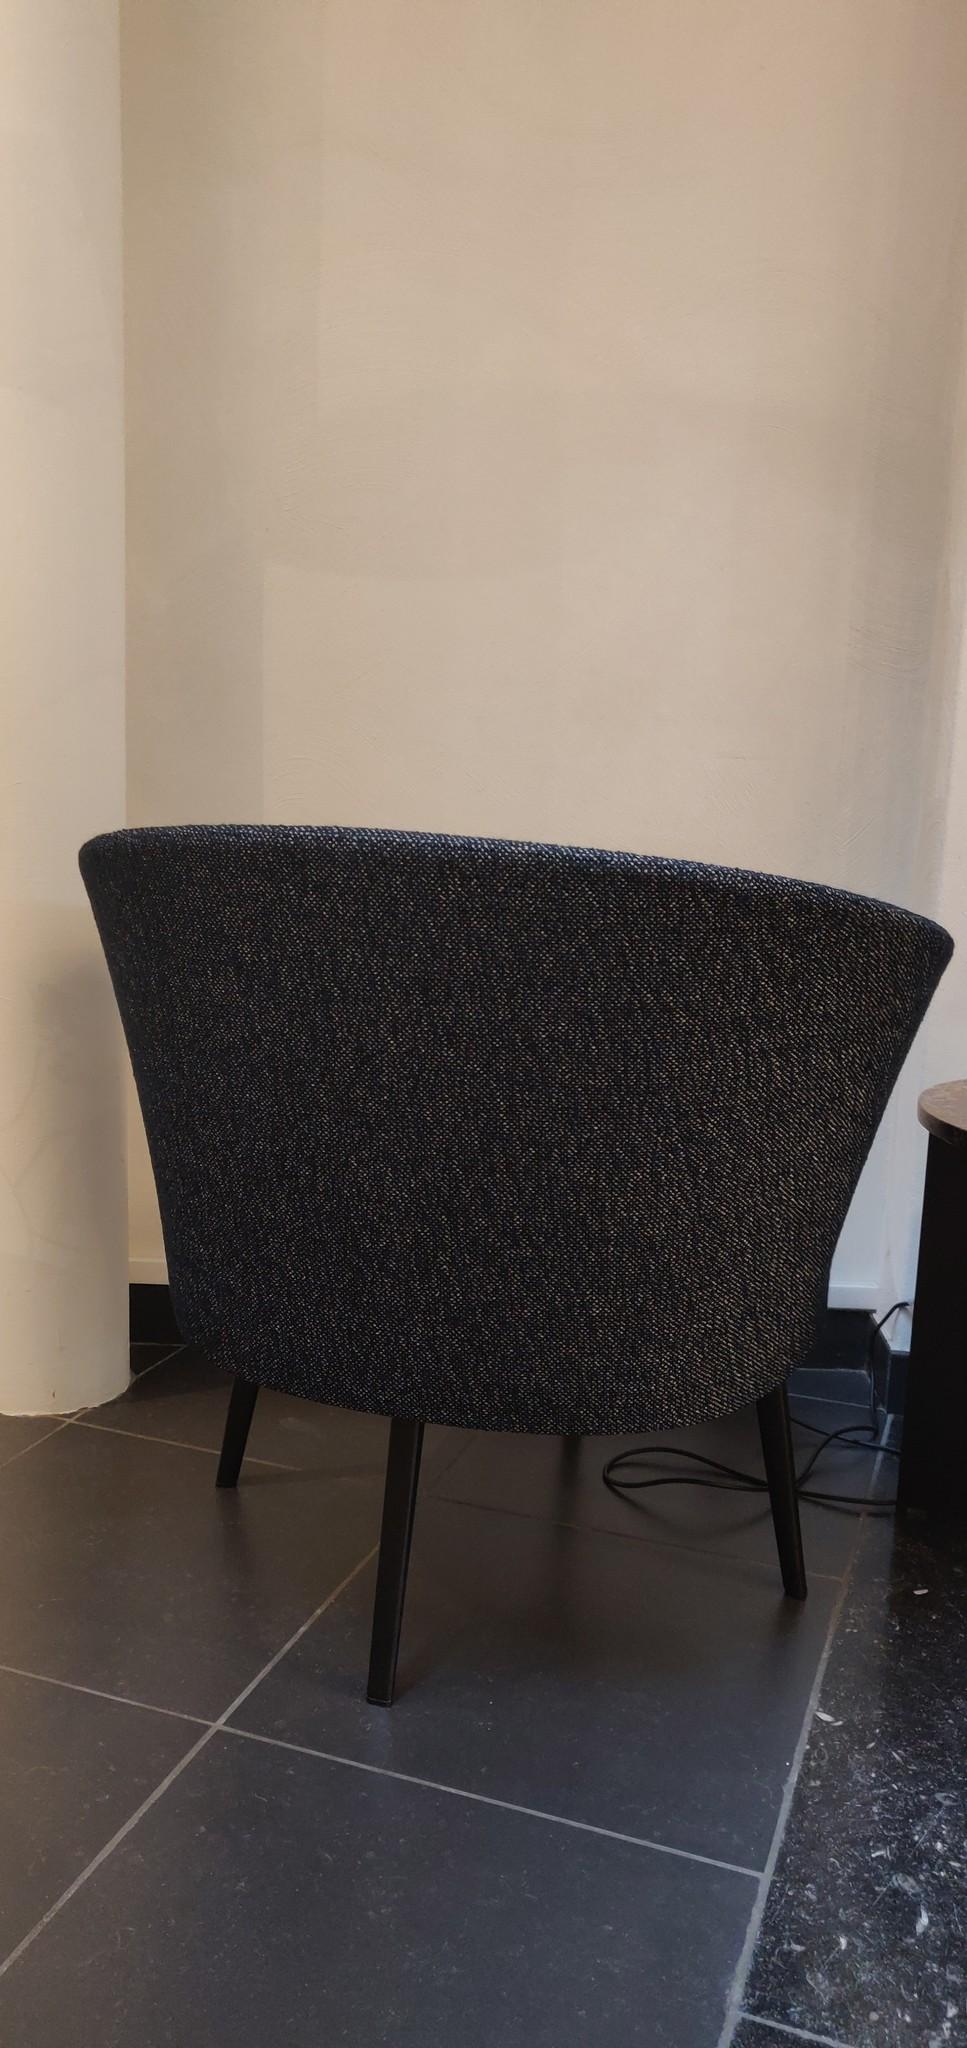 Toonzaalmodel Dorso BLACK POWDER COATED STEEL - FAIRWAY DARK BLUE 308-288-3